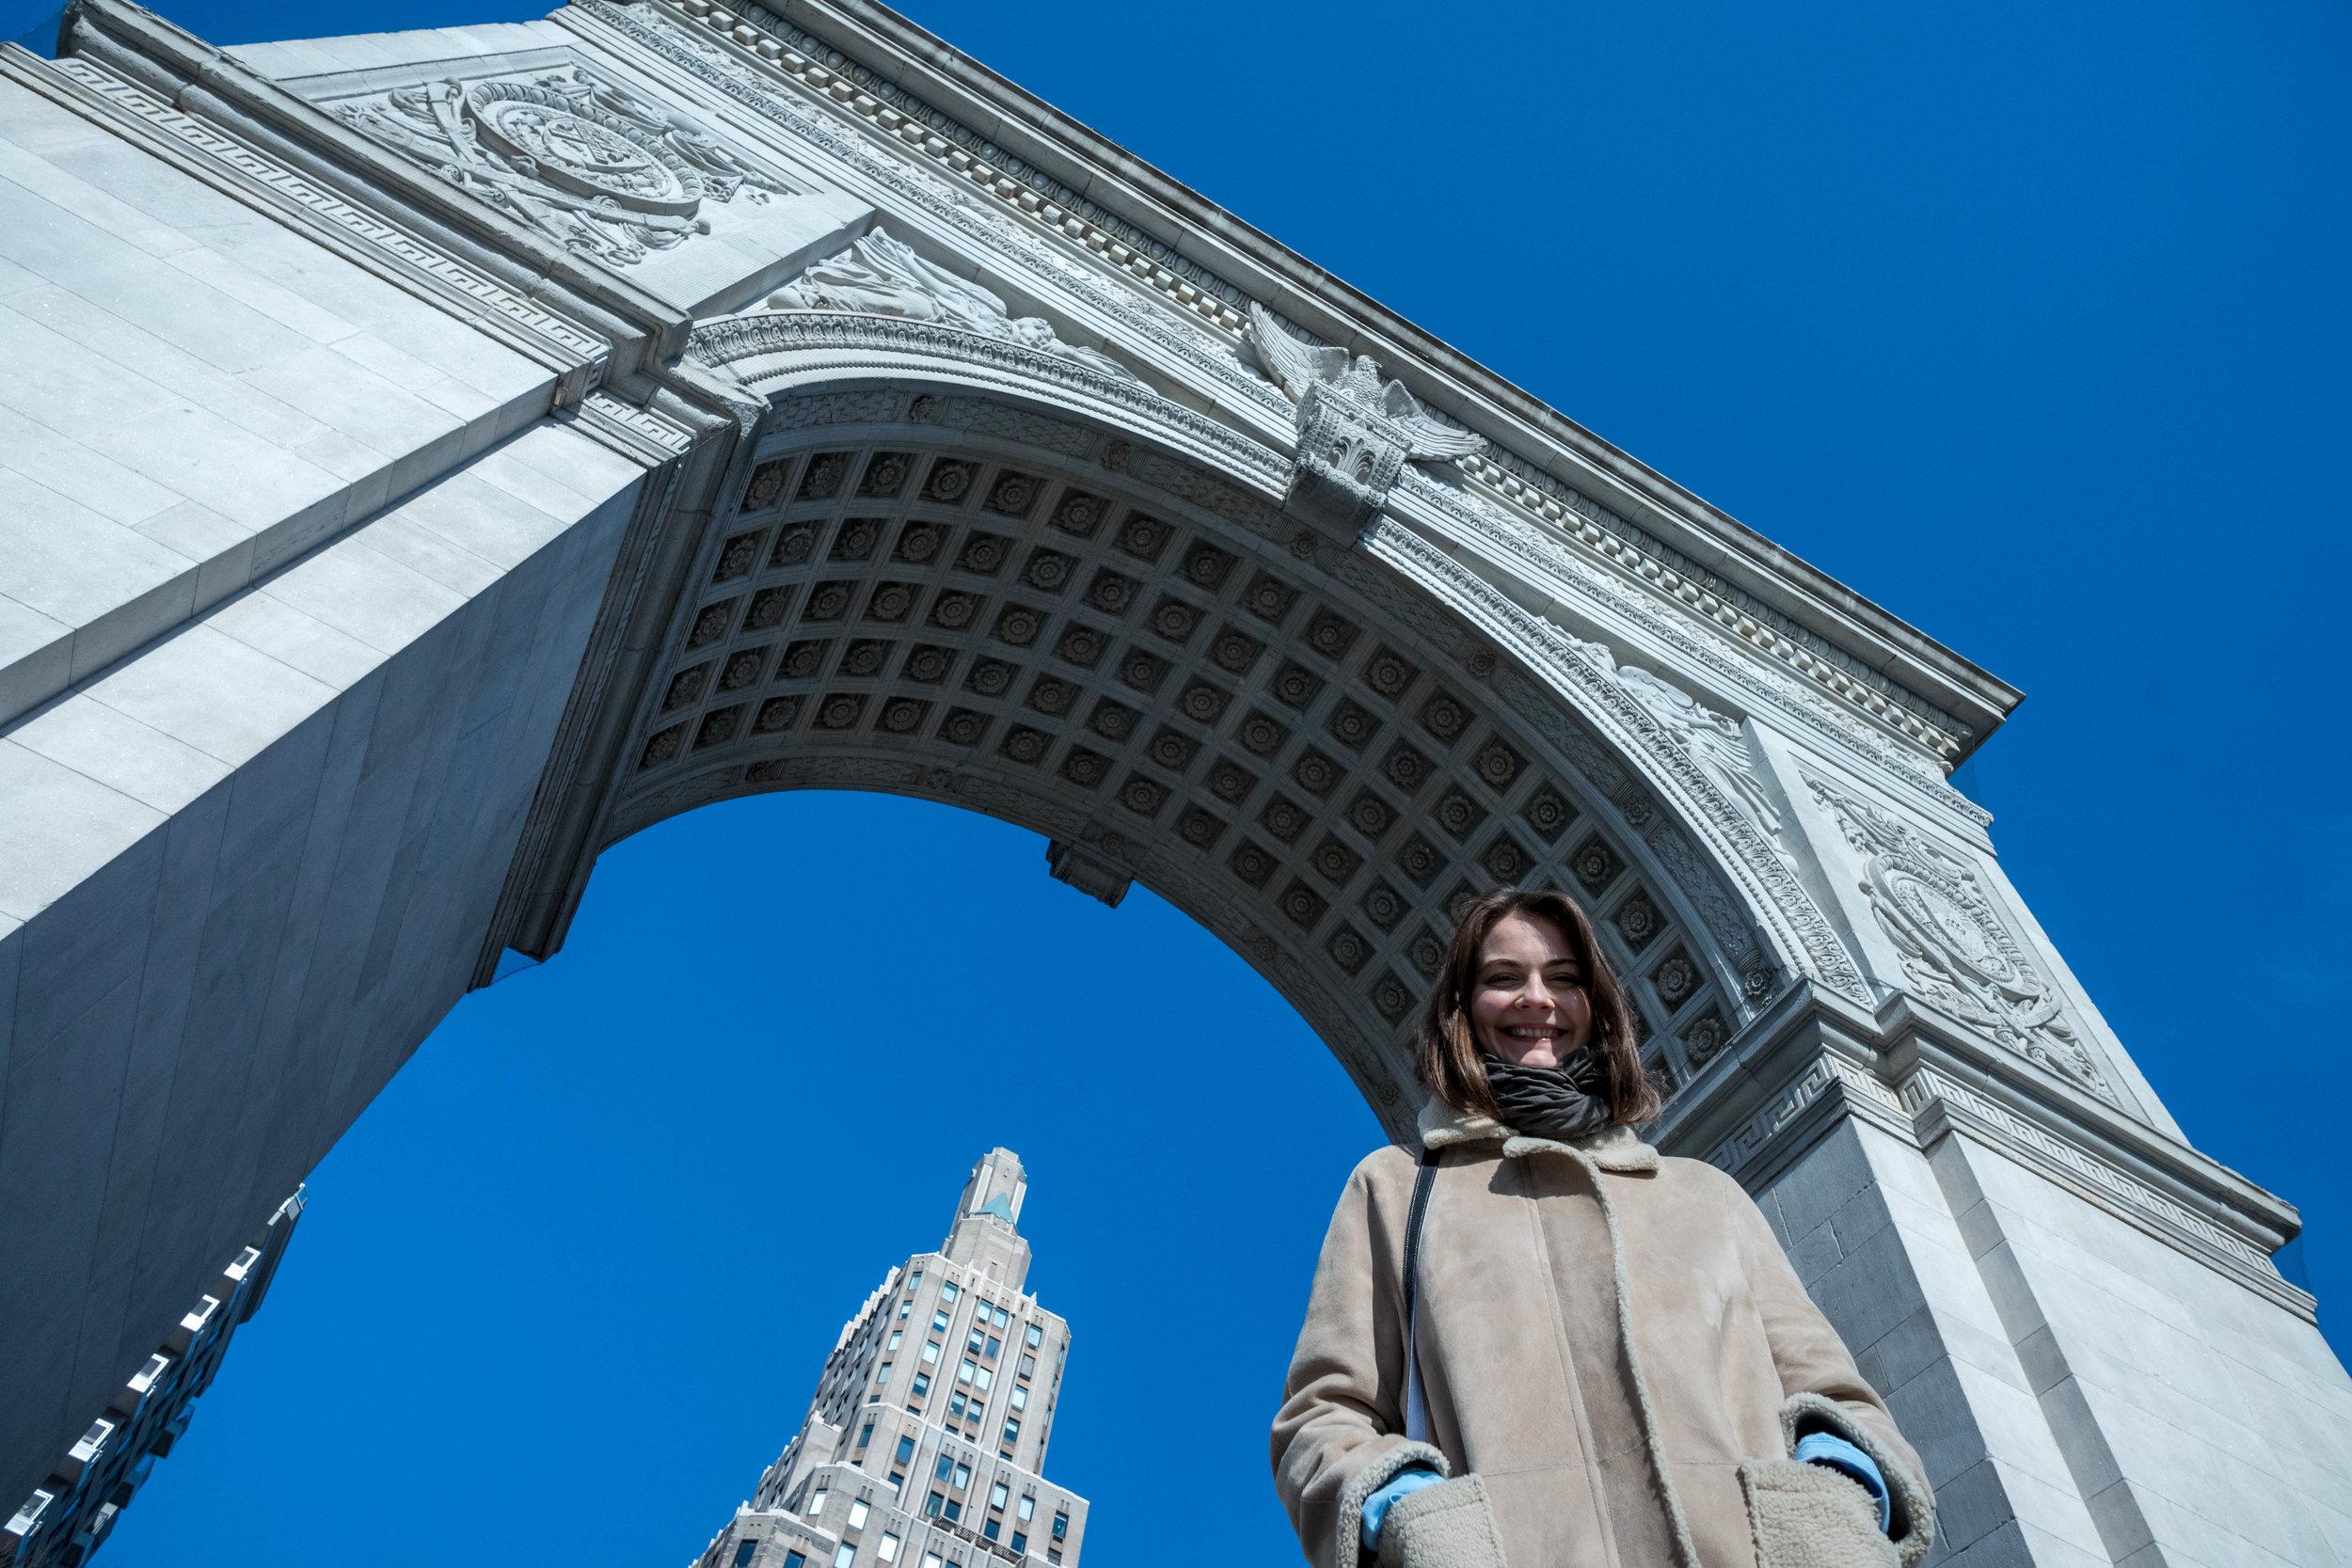 Leica SL + Leica 21mm f/1.4 Summilux - The Arch at Washington Square Park